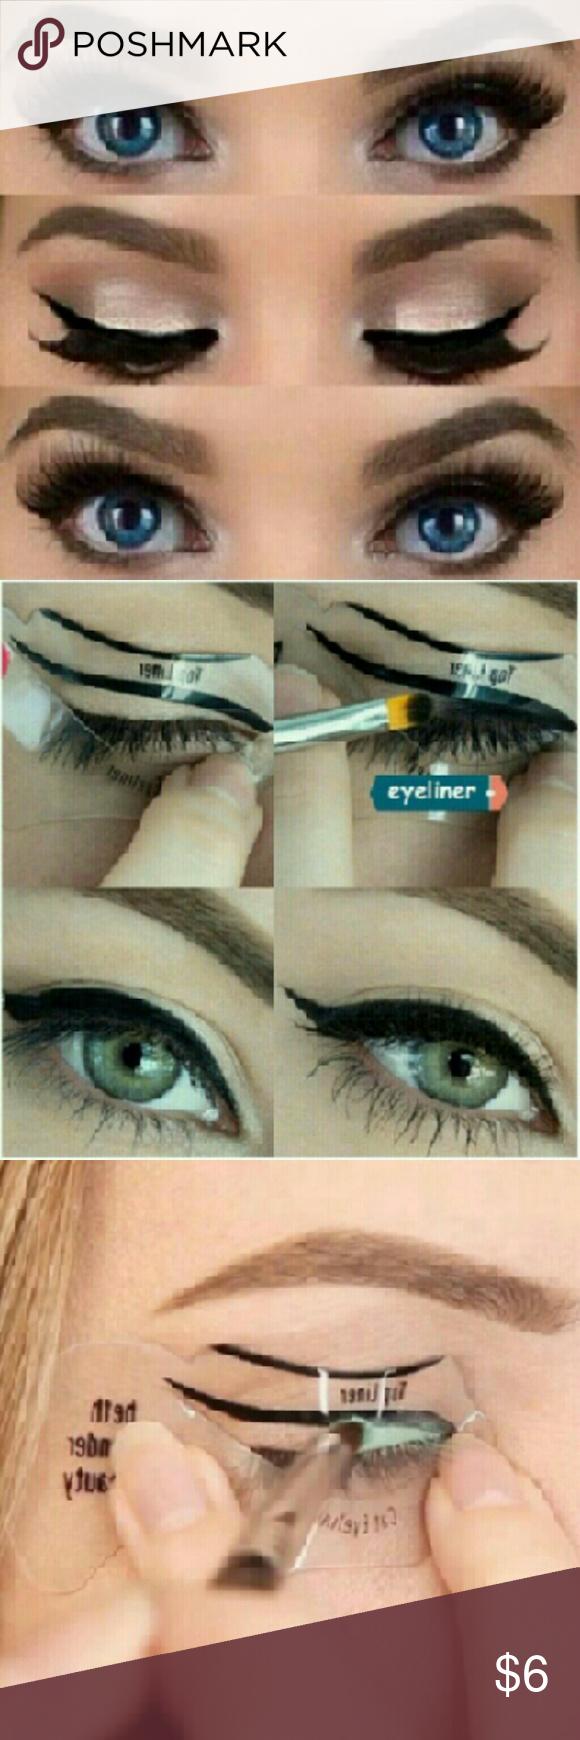 7 style in 1 set Quick Makeup Cat Eyeliner Smokey